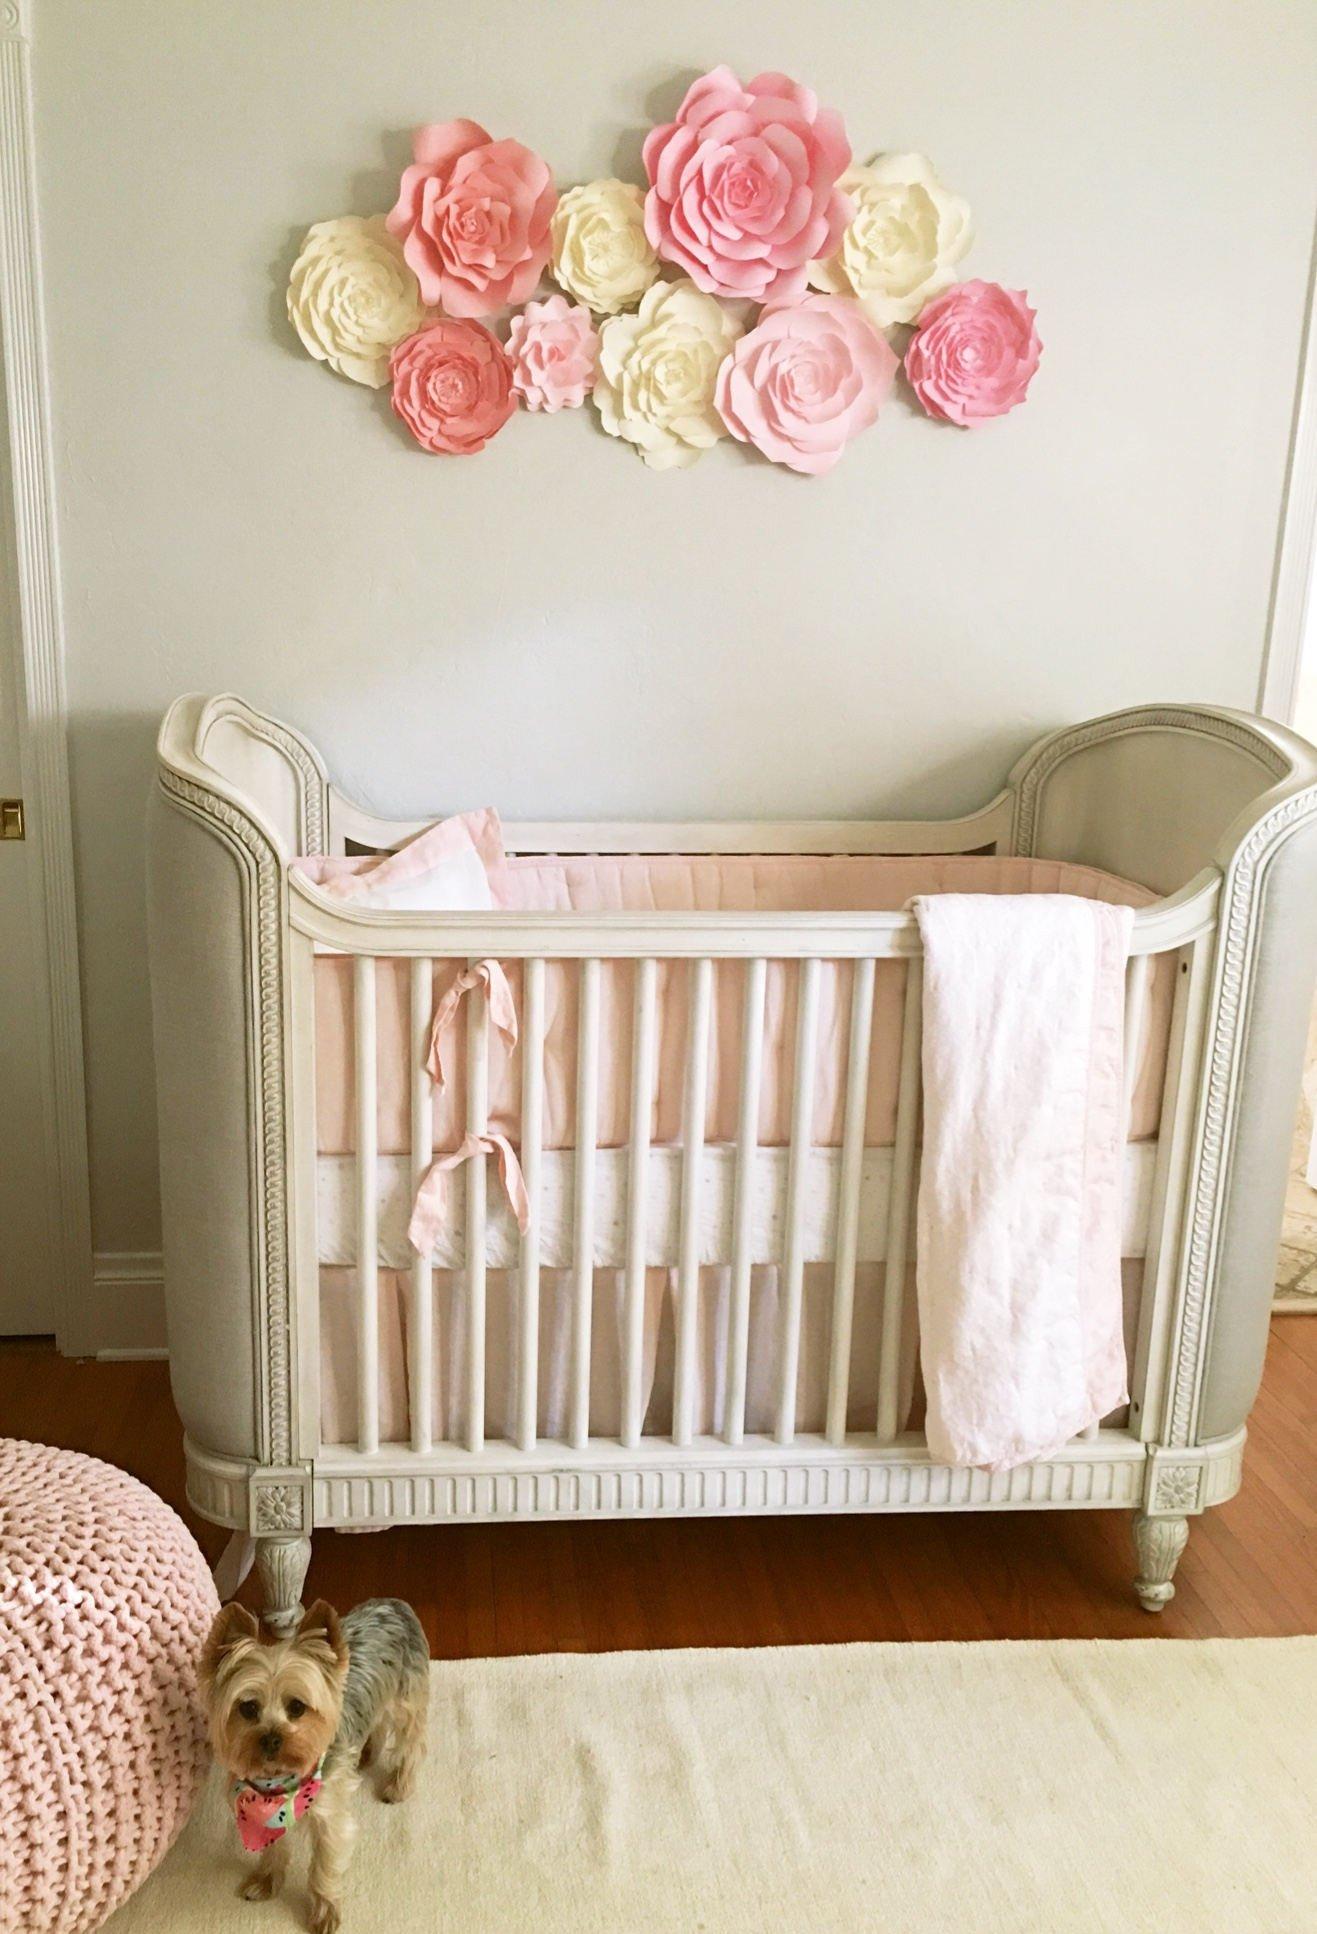 Baby Girl Room Wall Decor Elegant Baby Nursery Wall Decor Paper Flowers for Girls Nursery